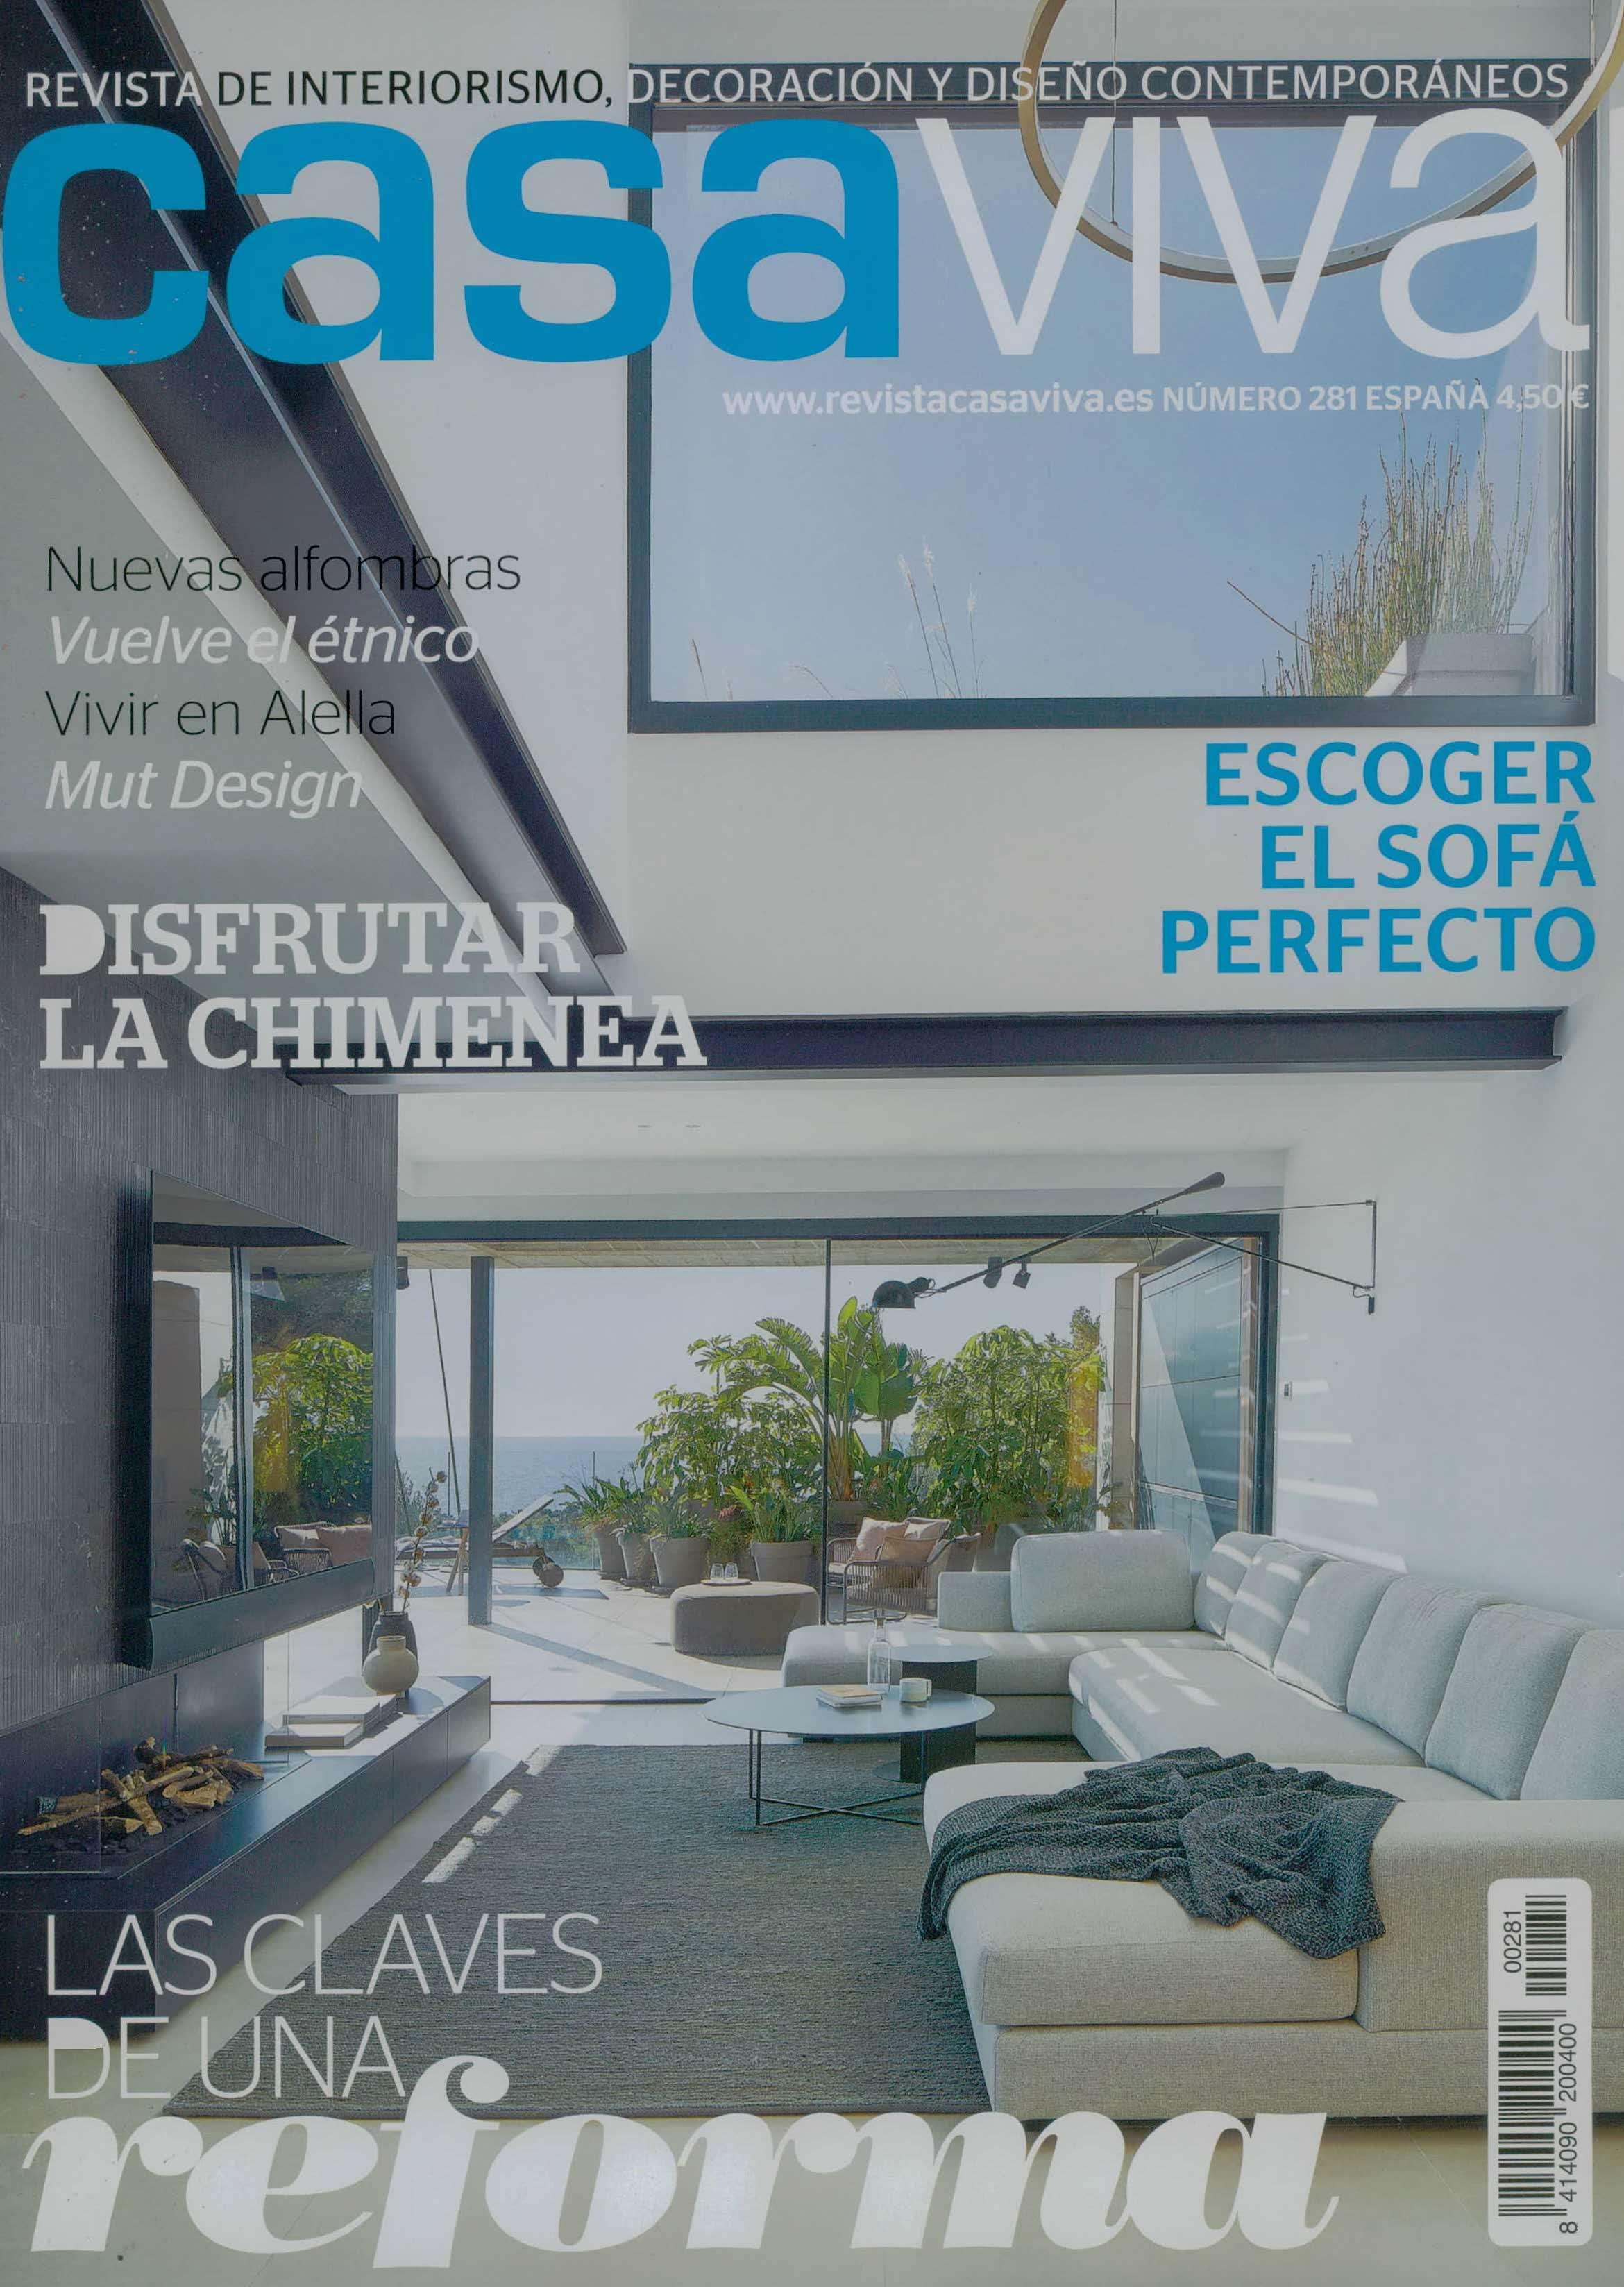 2020.10.01 – Casa Viva ES – cover